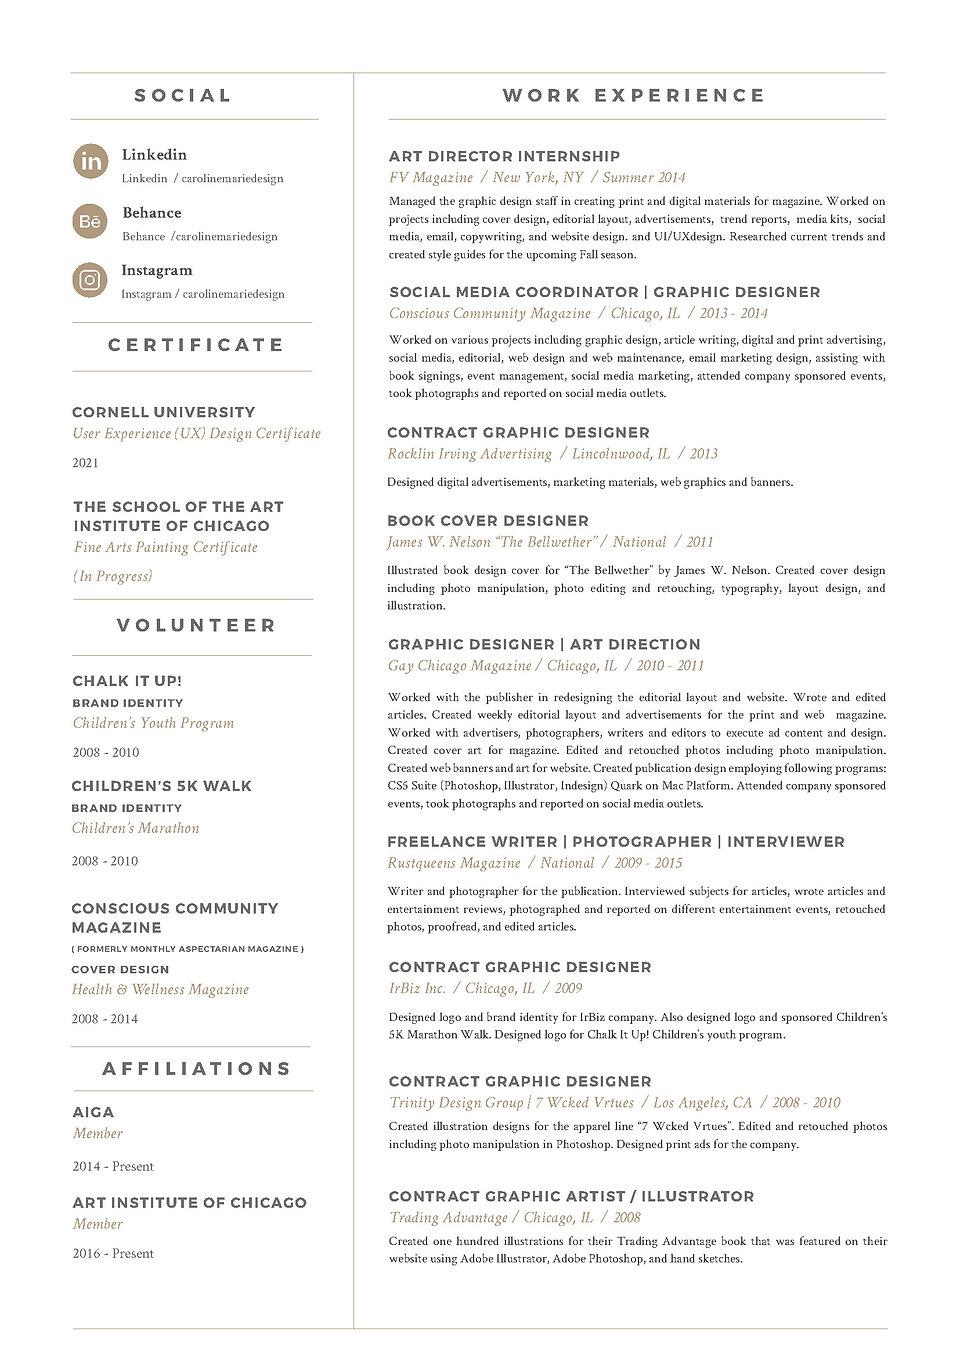 Resume_Caroline Dabrowski_2021_Page_2.jp